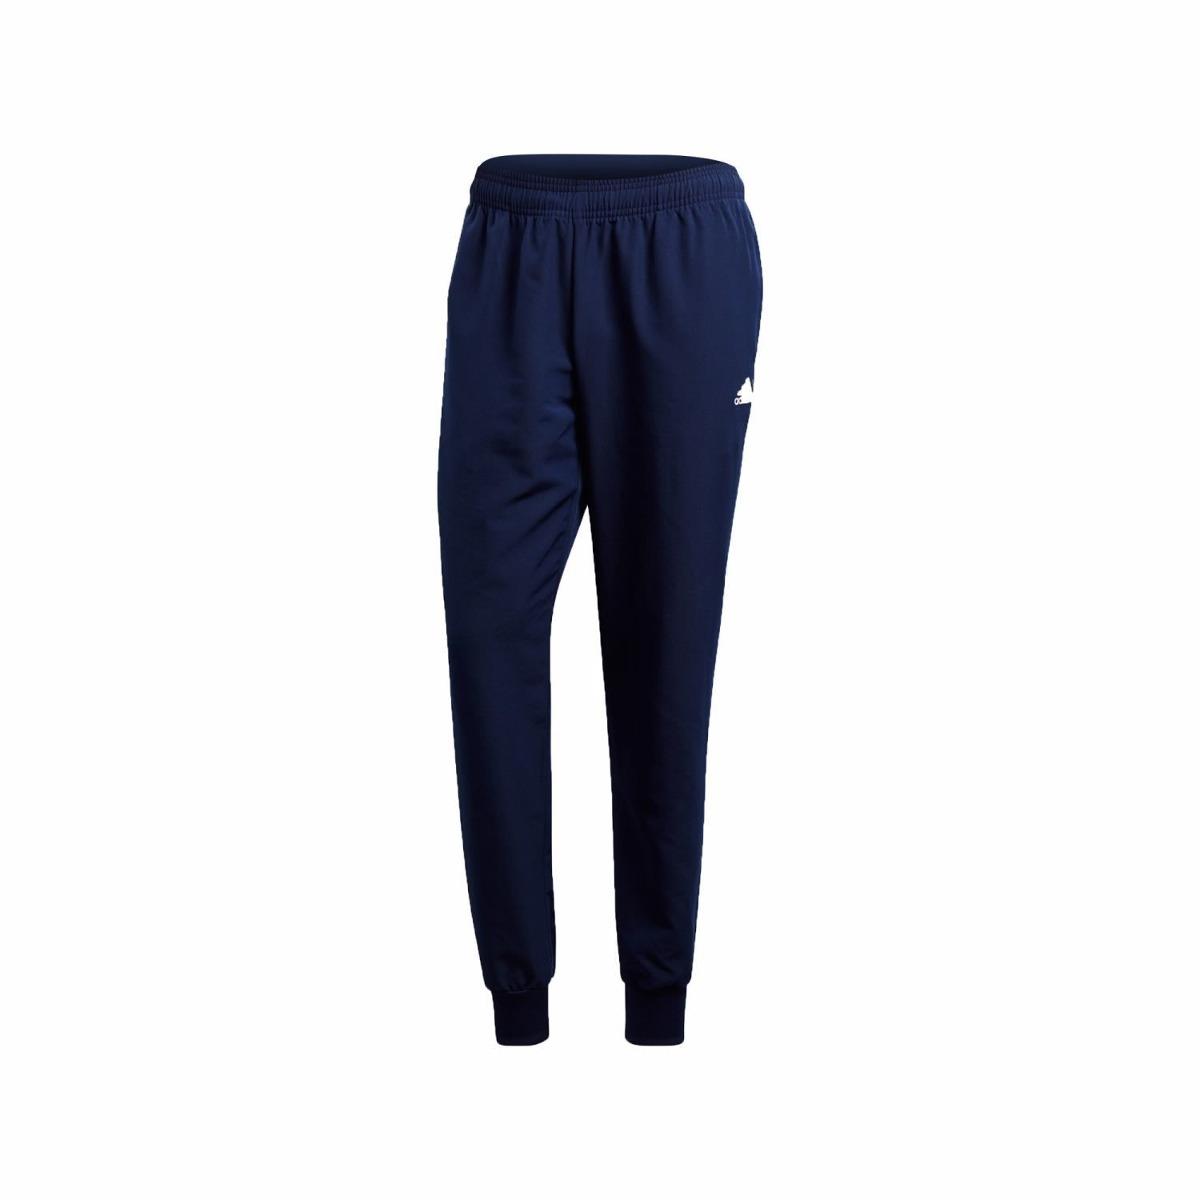 00 2 Gratis Envio En Stanford Pants Casual Essentials Adidas 899 aqxOOU8pw